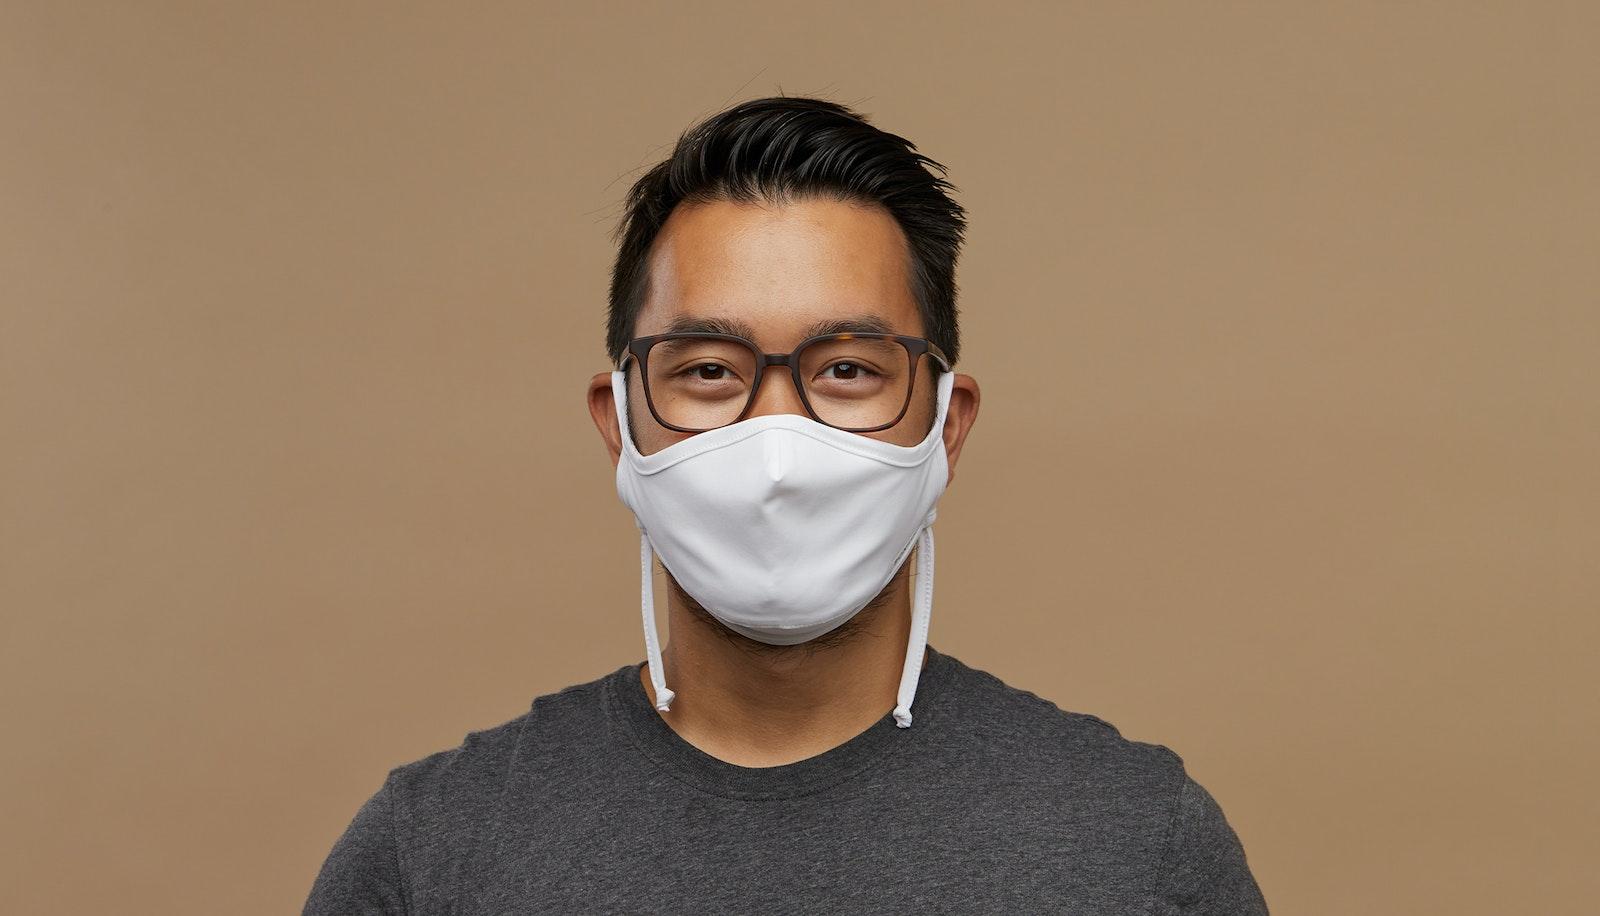 Lunettes tendance Accessoire Hommes Femmes BonLook Mask White